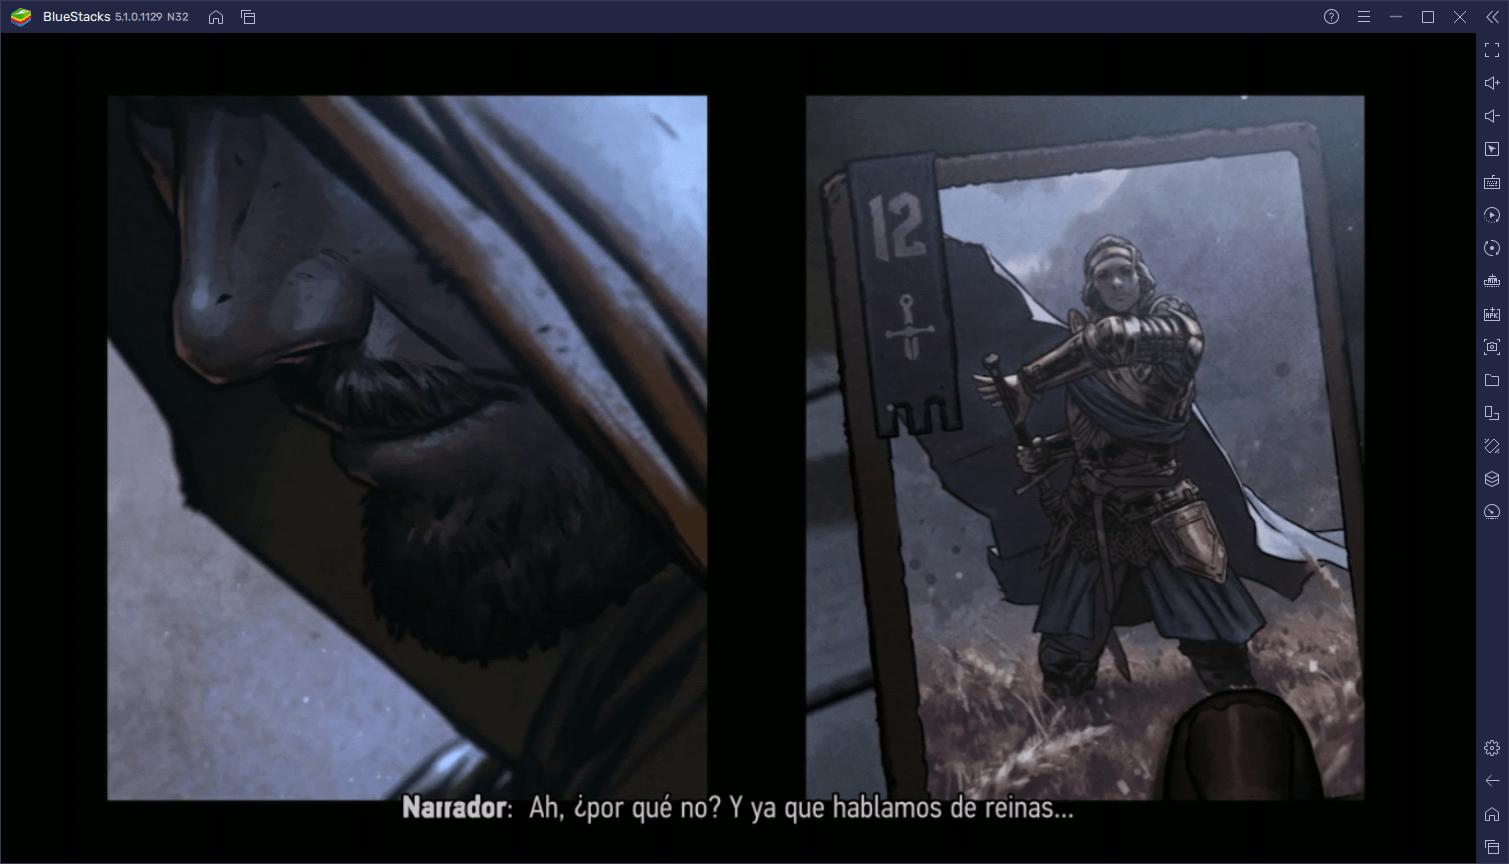 Cómo Jugar The Witcher Tales: Thronebreaker en PC Gratis